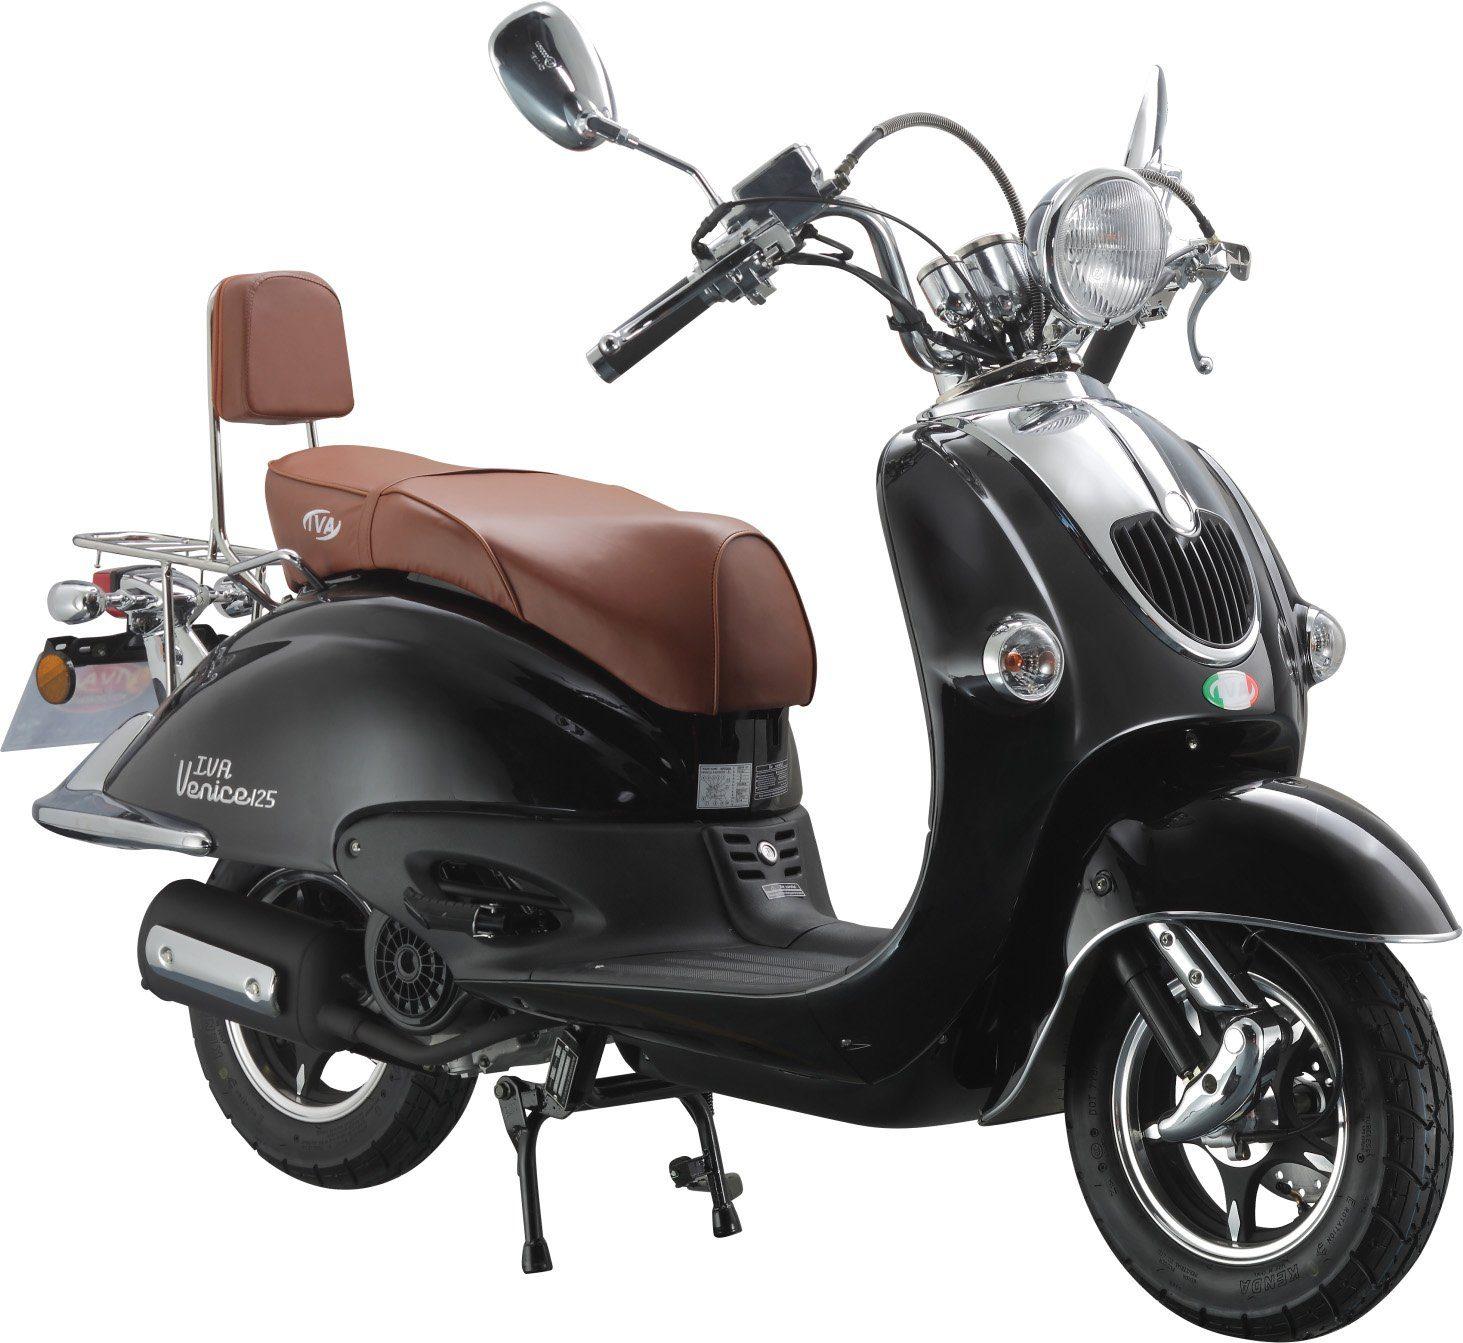 IVA Motorroller Retro, 125 ccm 75 km/h, schwarz-glanz, »VENICE«